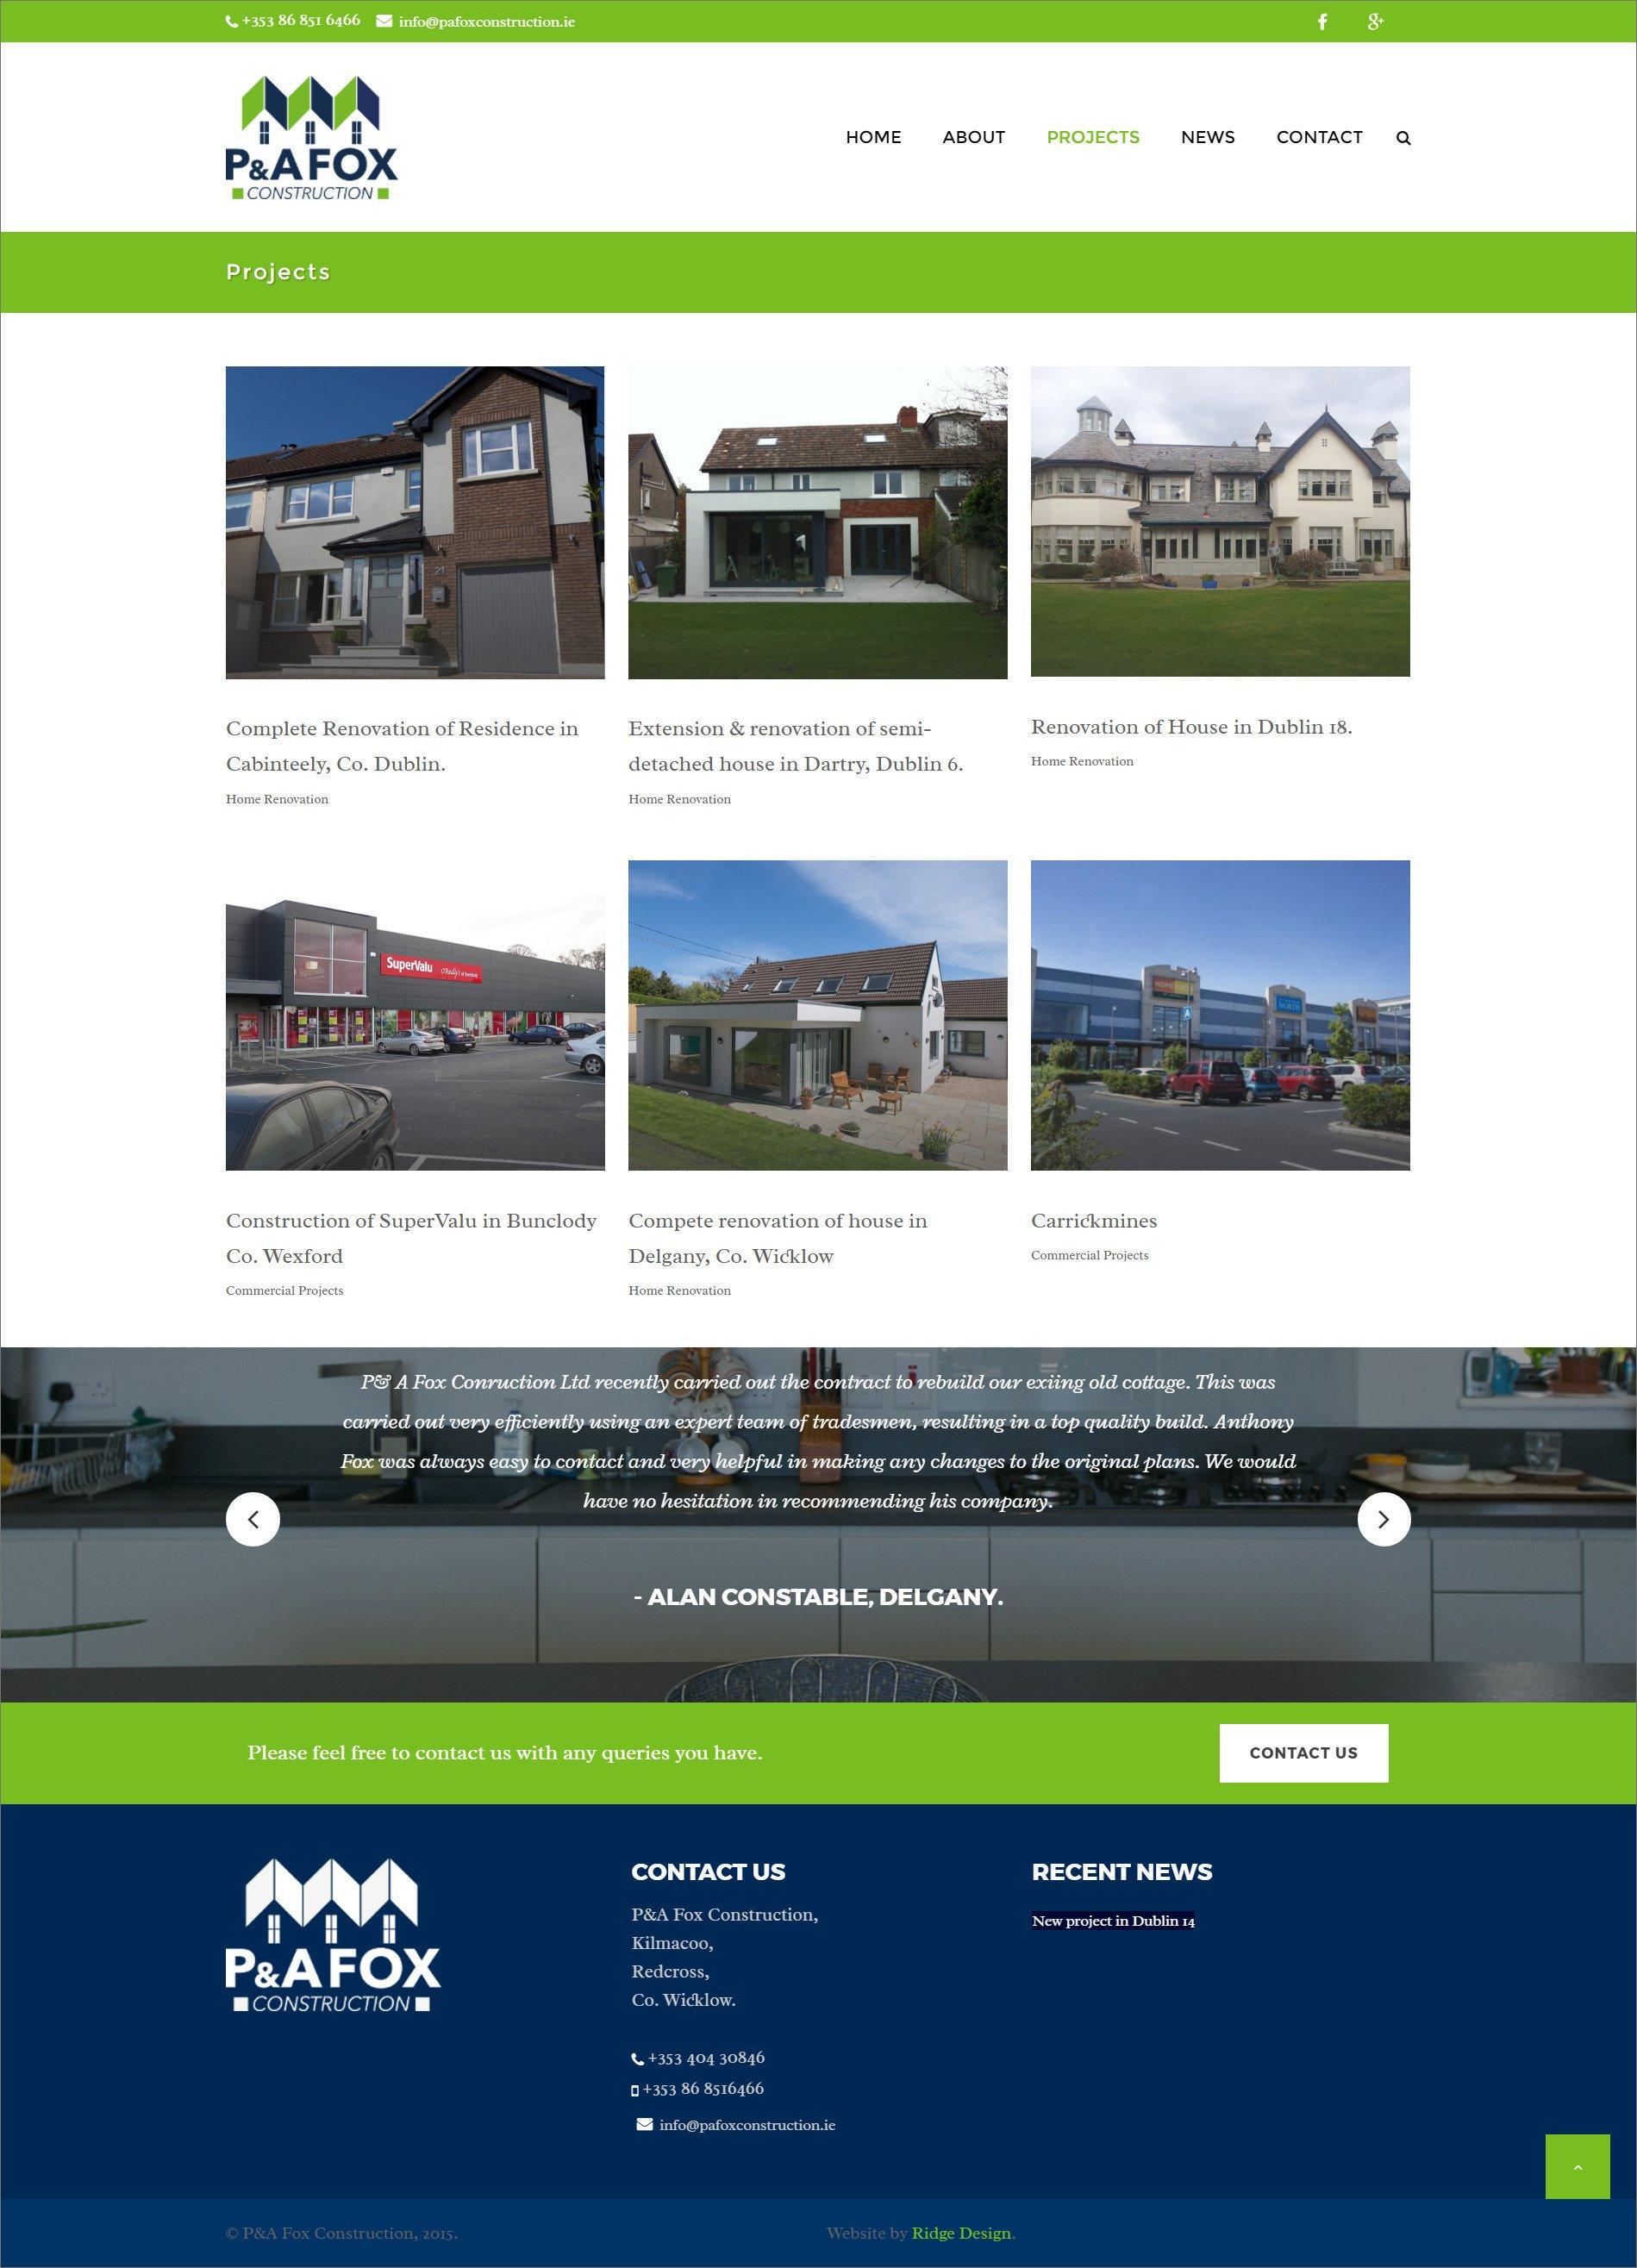 Ridge Design-Website-Design-PA-Fox-Projects